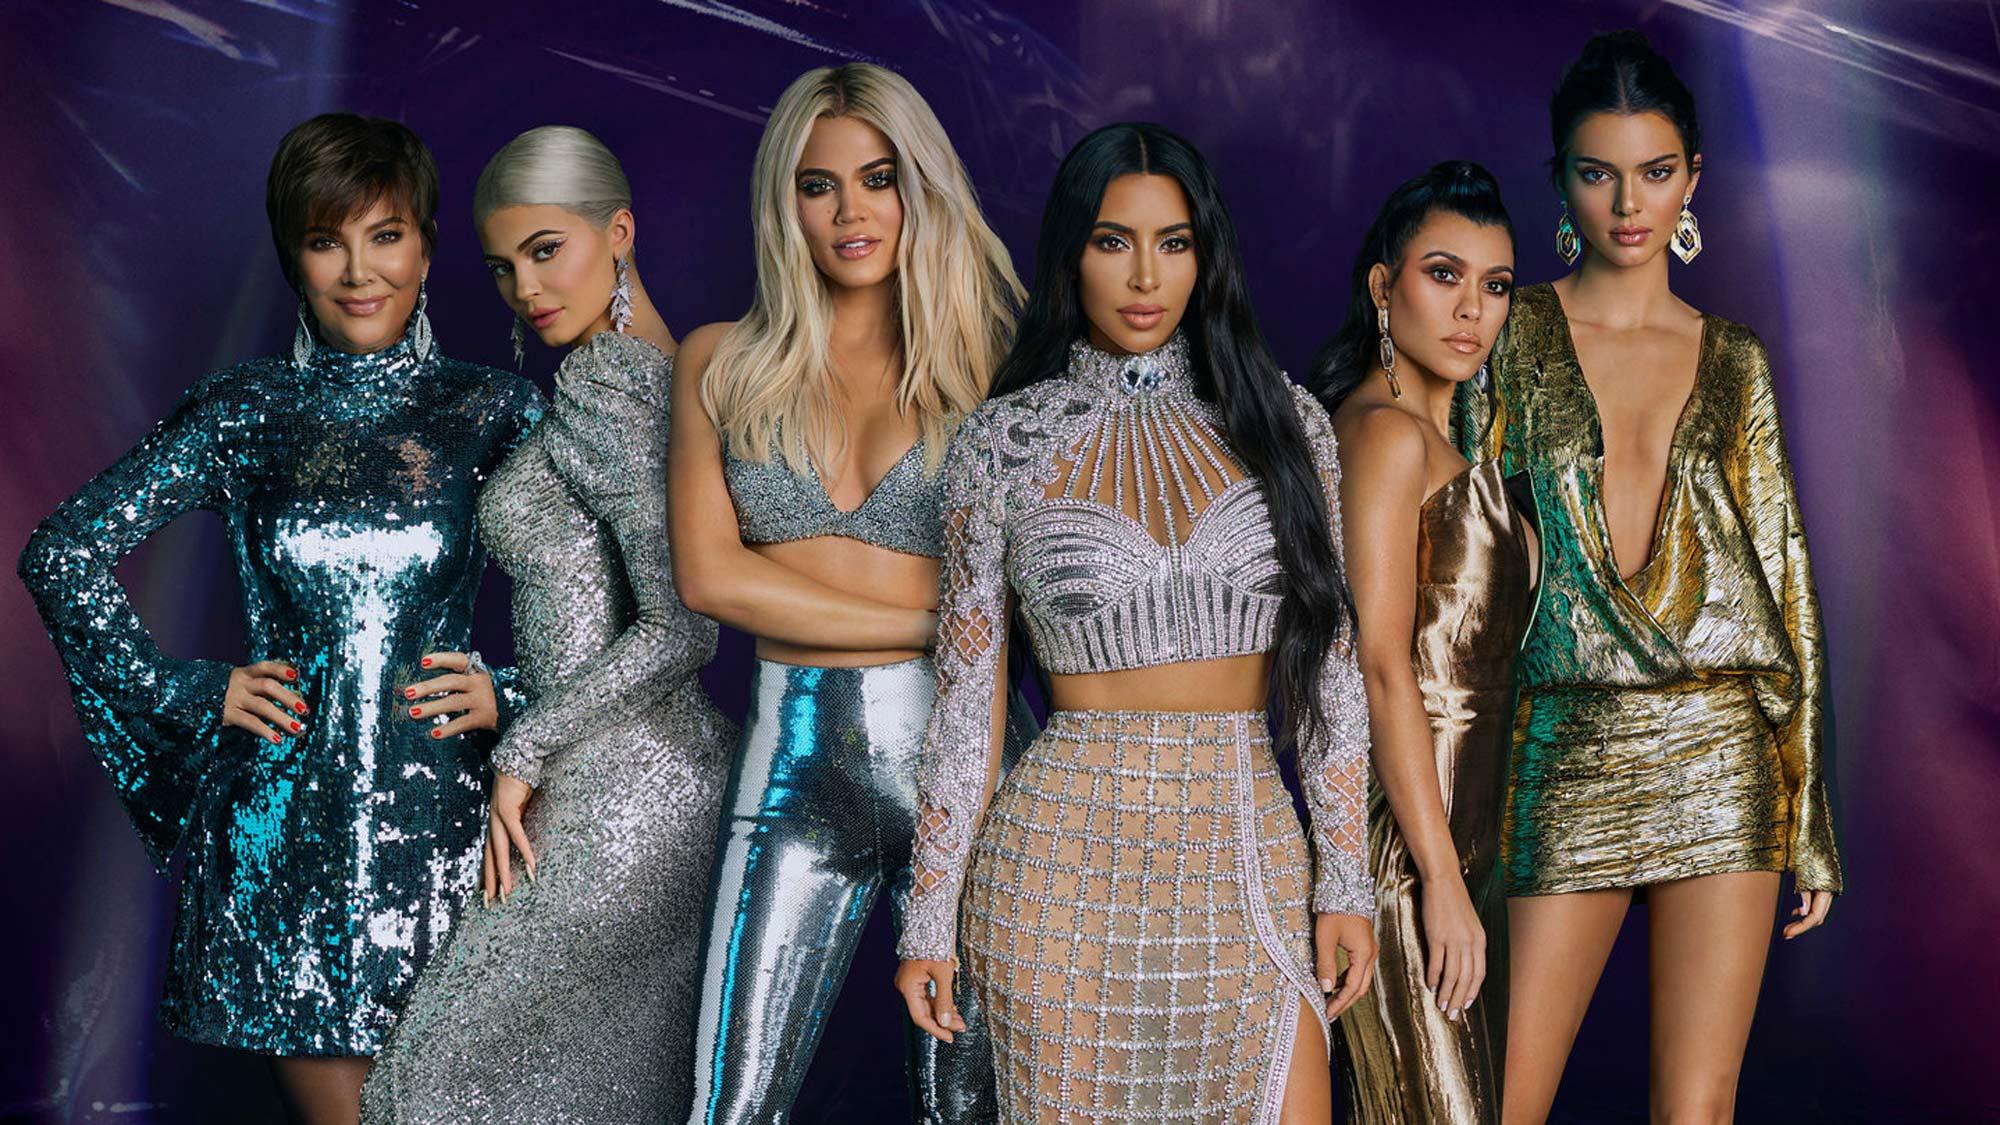 Canceled TV shows: Keeping Up with the Kardashians season 20